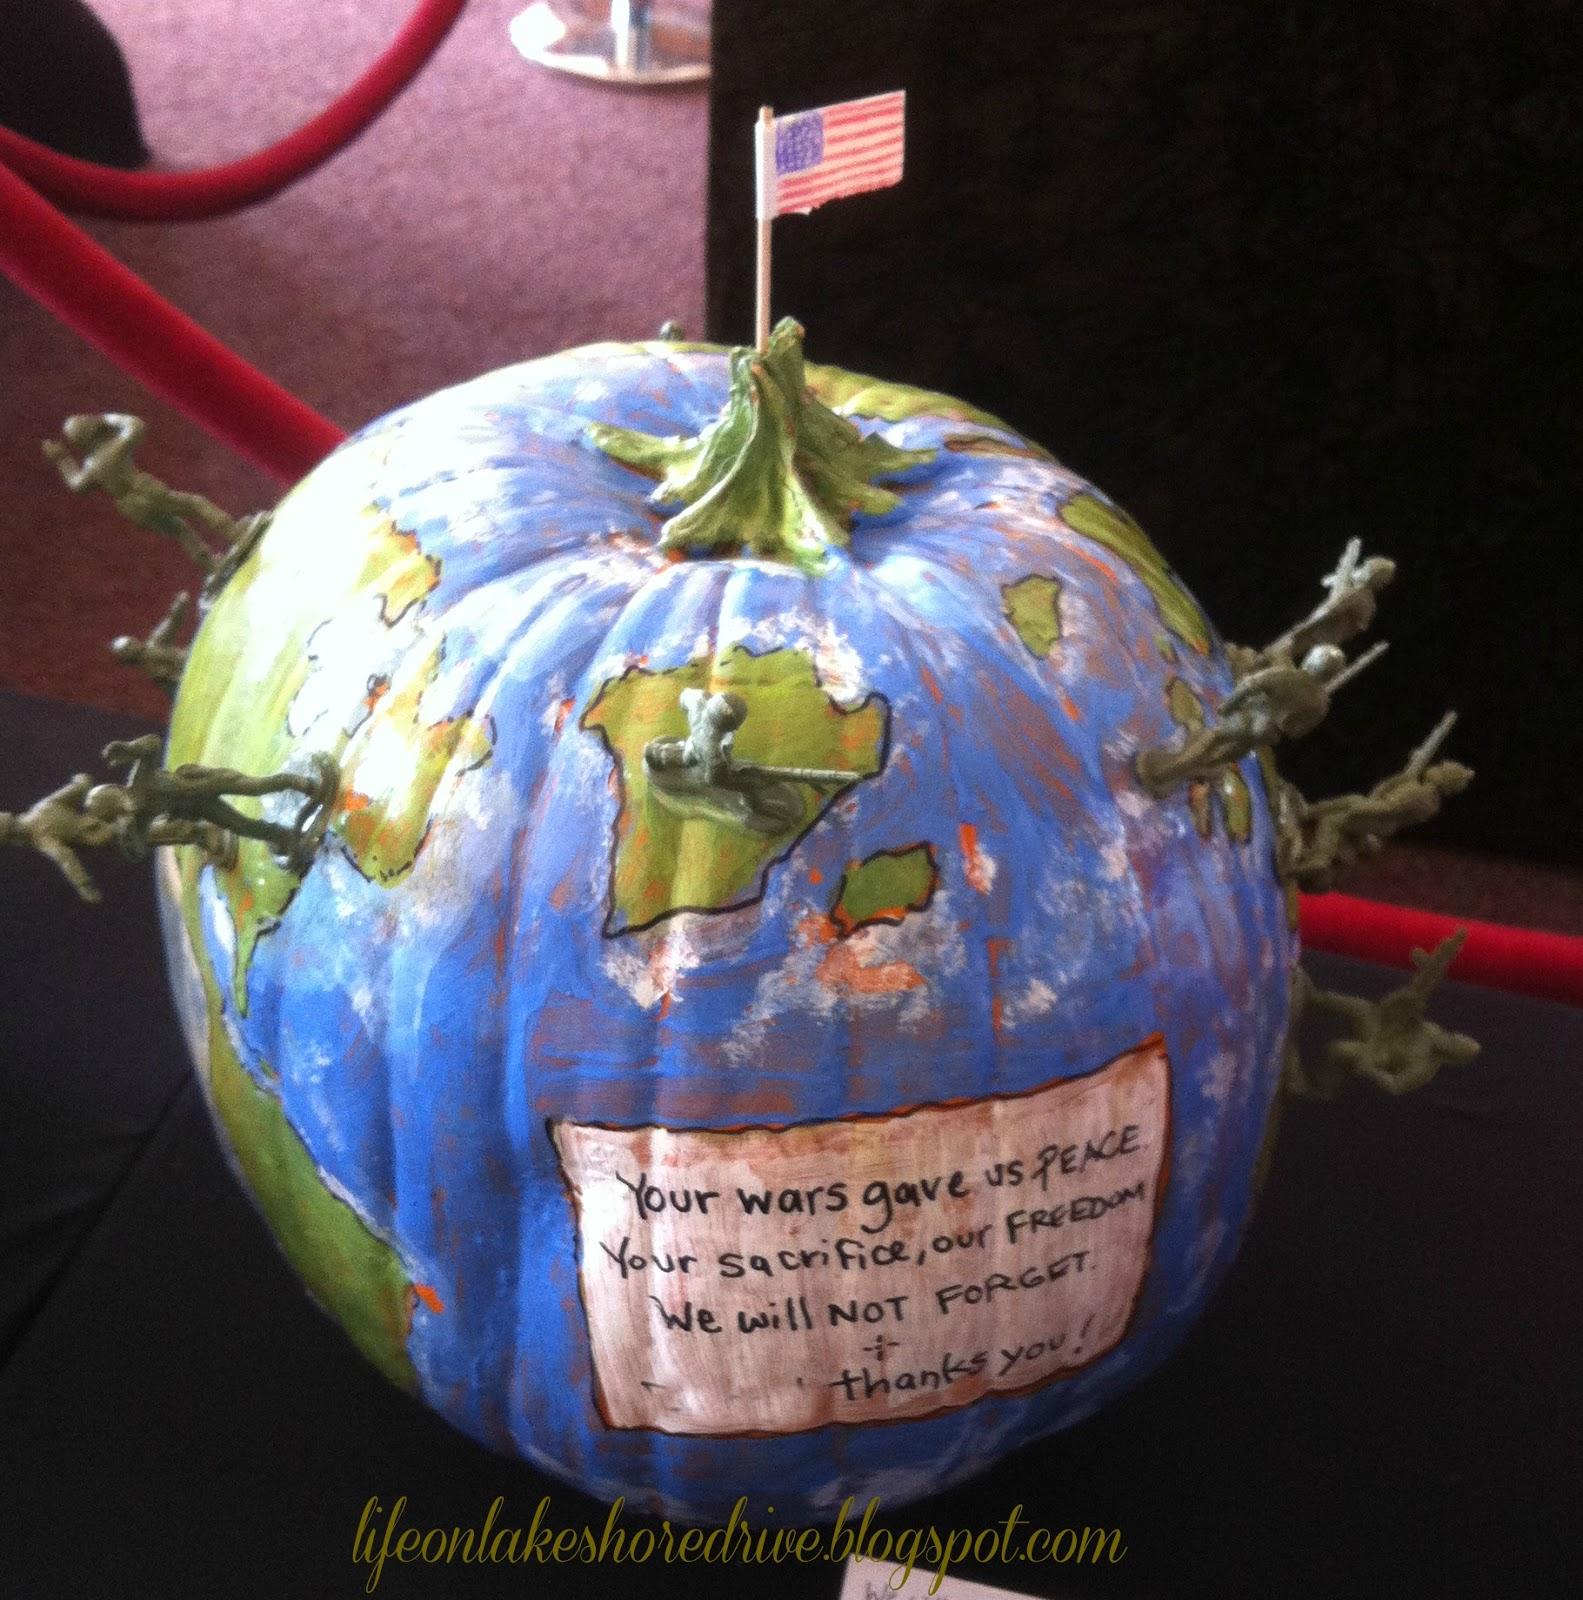 No Carve Pumpkin Decorating Ideas  & No Carve Pumpkin Ideas |Life on Lakeshore Drive